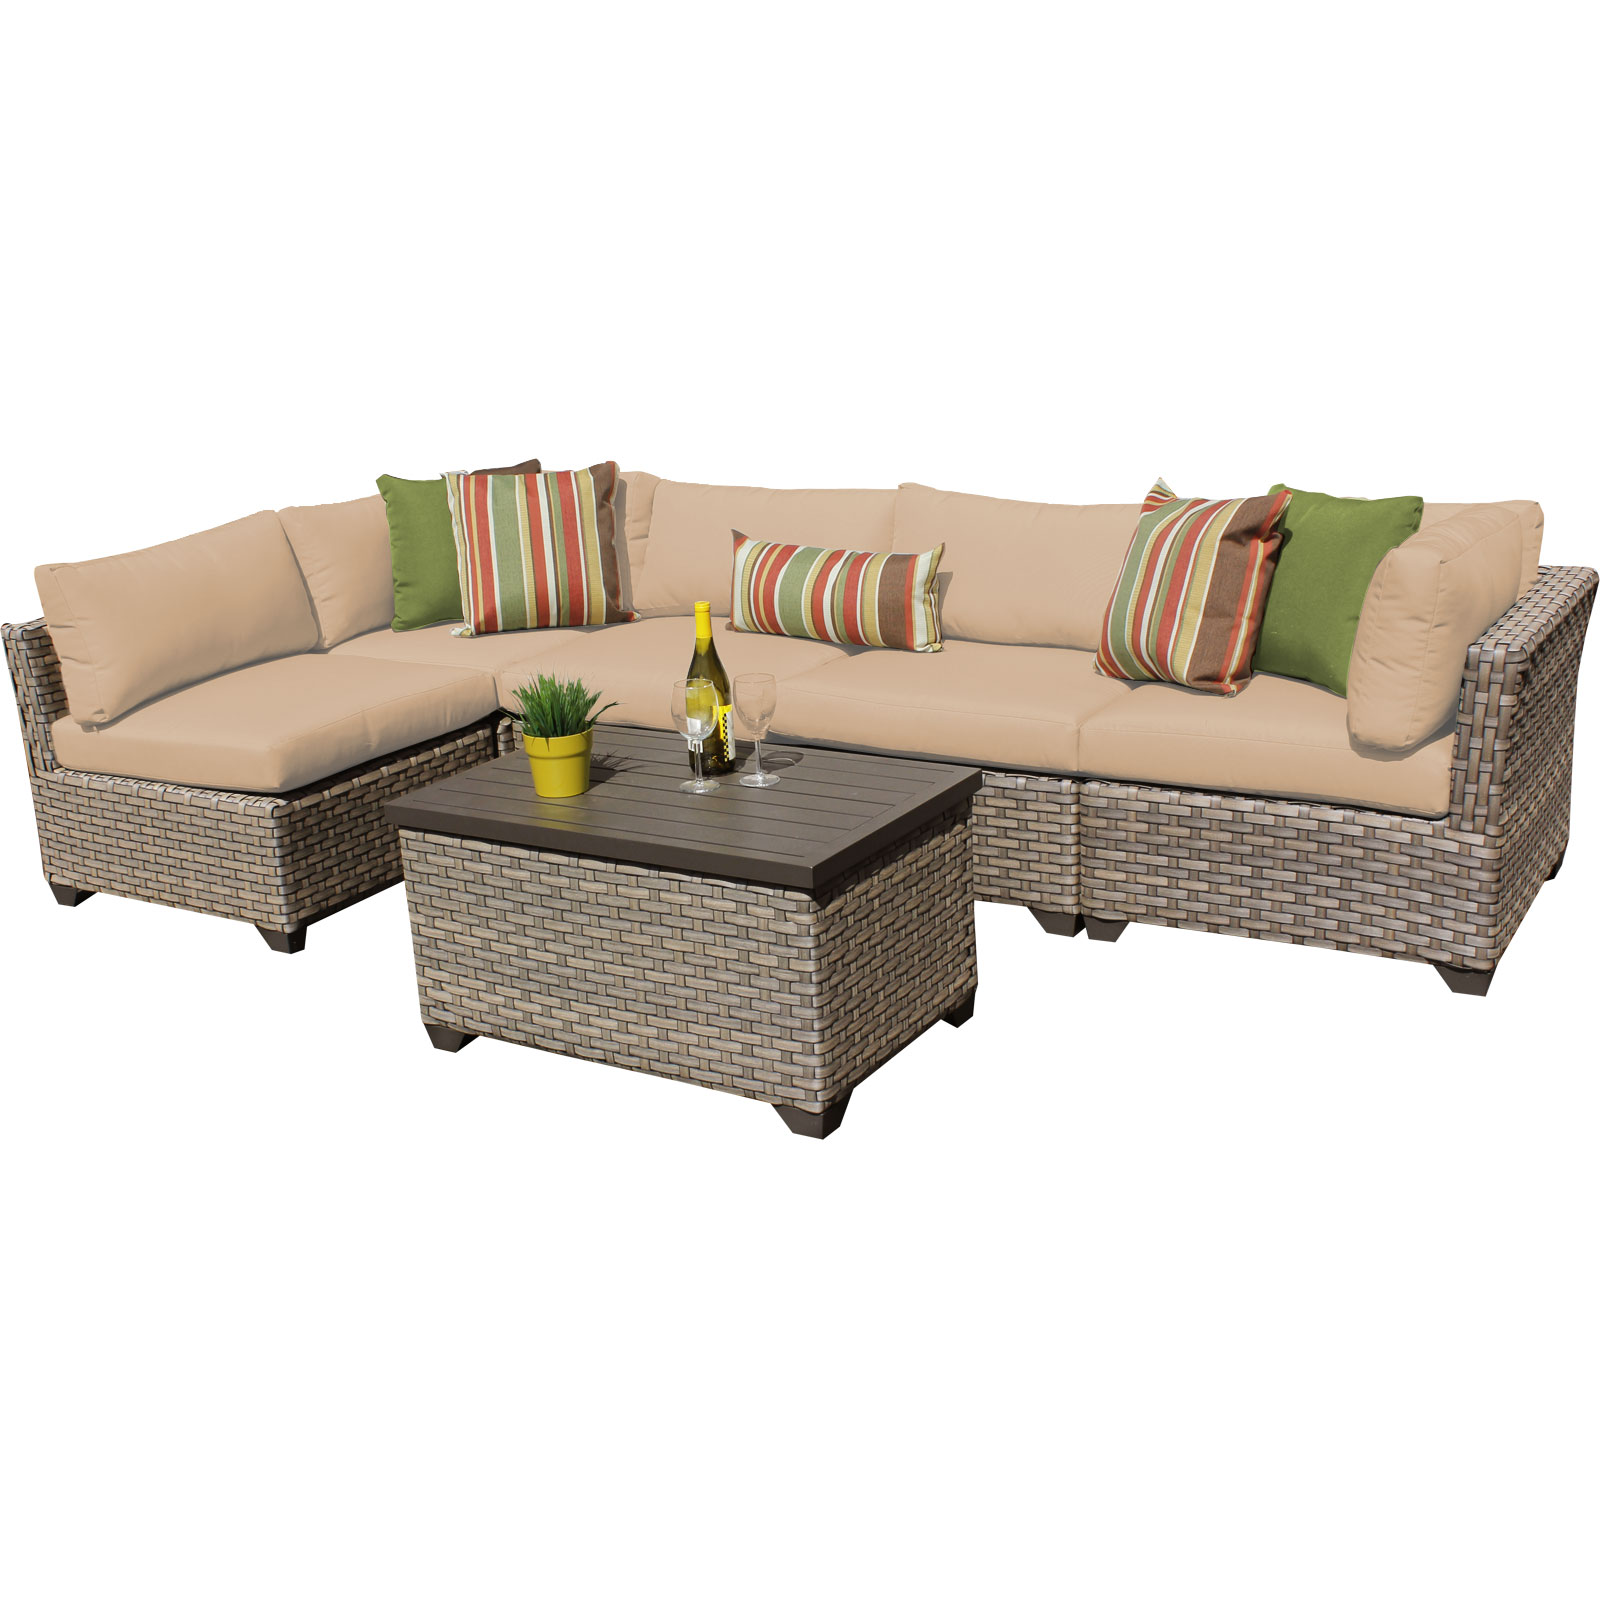 Hampton 6 Piece Outdoor Wicker Patio Furniture Set 06a by TK Classics